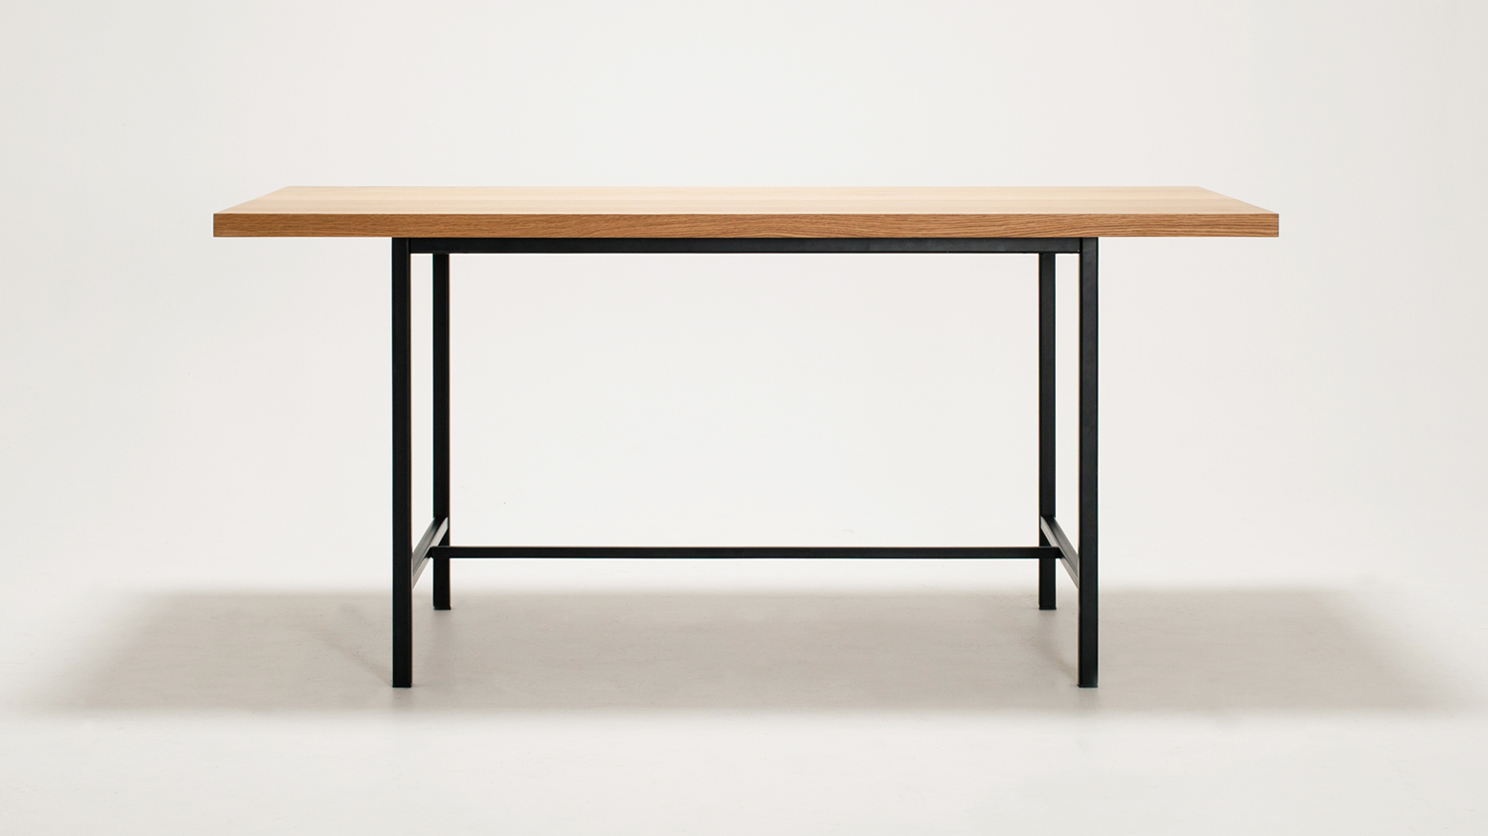 EQ3 Kendall Dining Table Solid Oak Top Grid Furnishings : EQ3 Kendell Dining Table Oak top Copy from gridfurnishings.com size 1488 x 836 jpeg 615kB